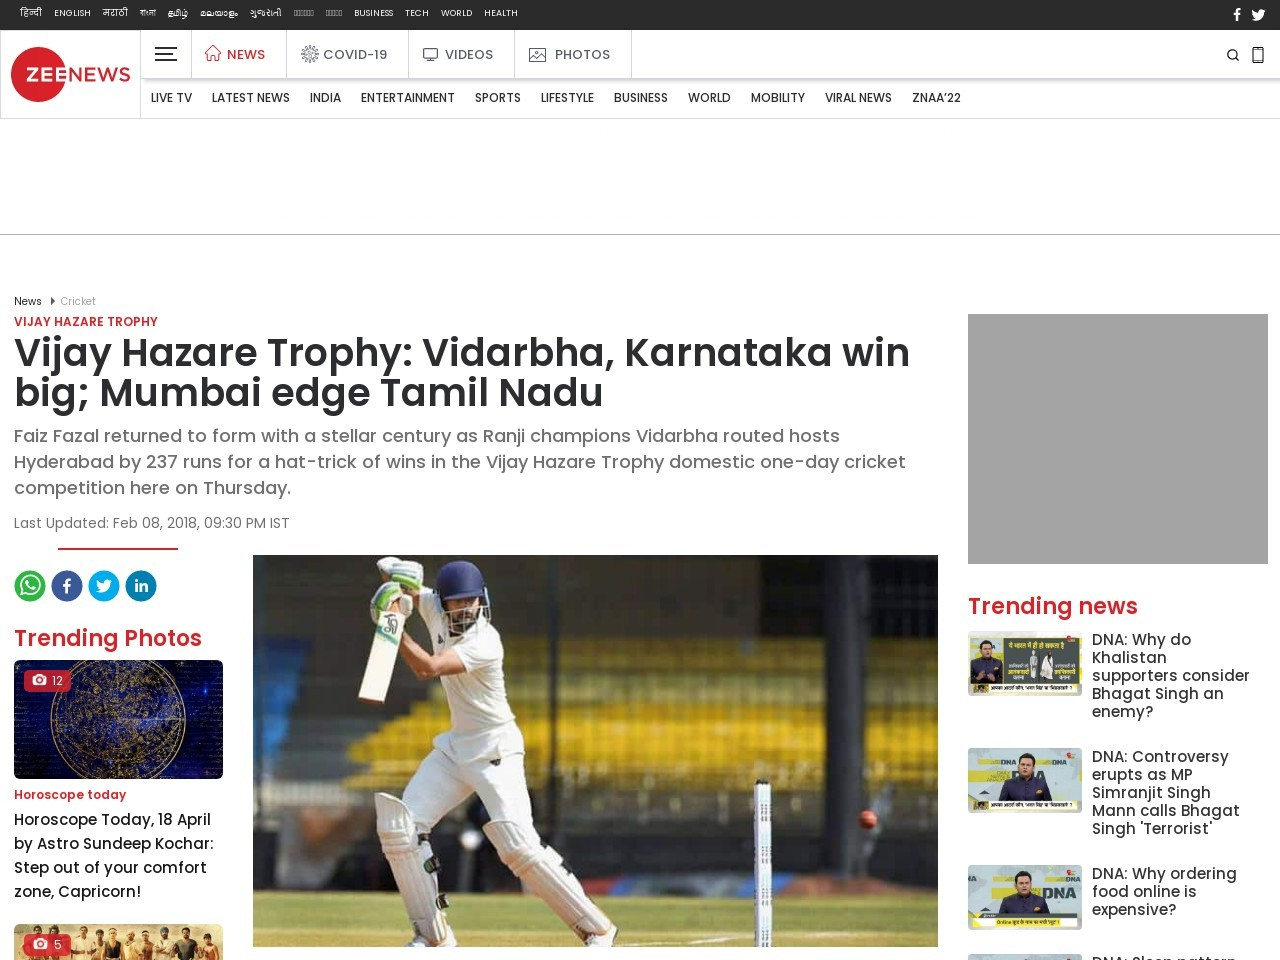 Vijay Hazare Trophy: Vidarbha, Karnataka win big; Mumbai edge Tamil Nadu